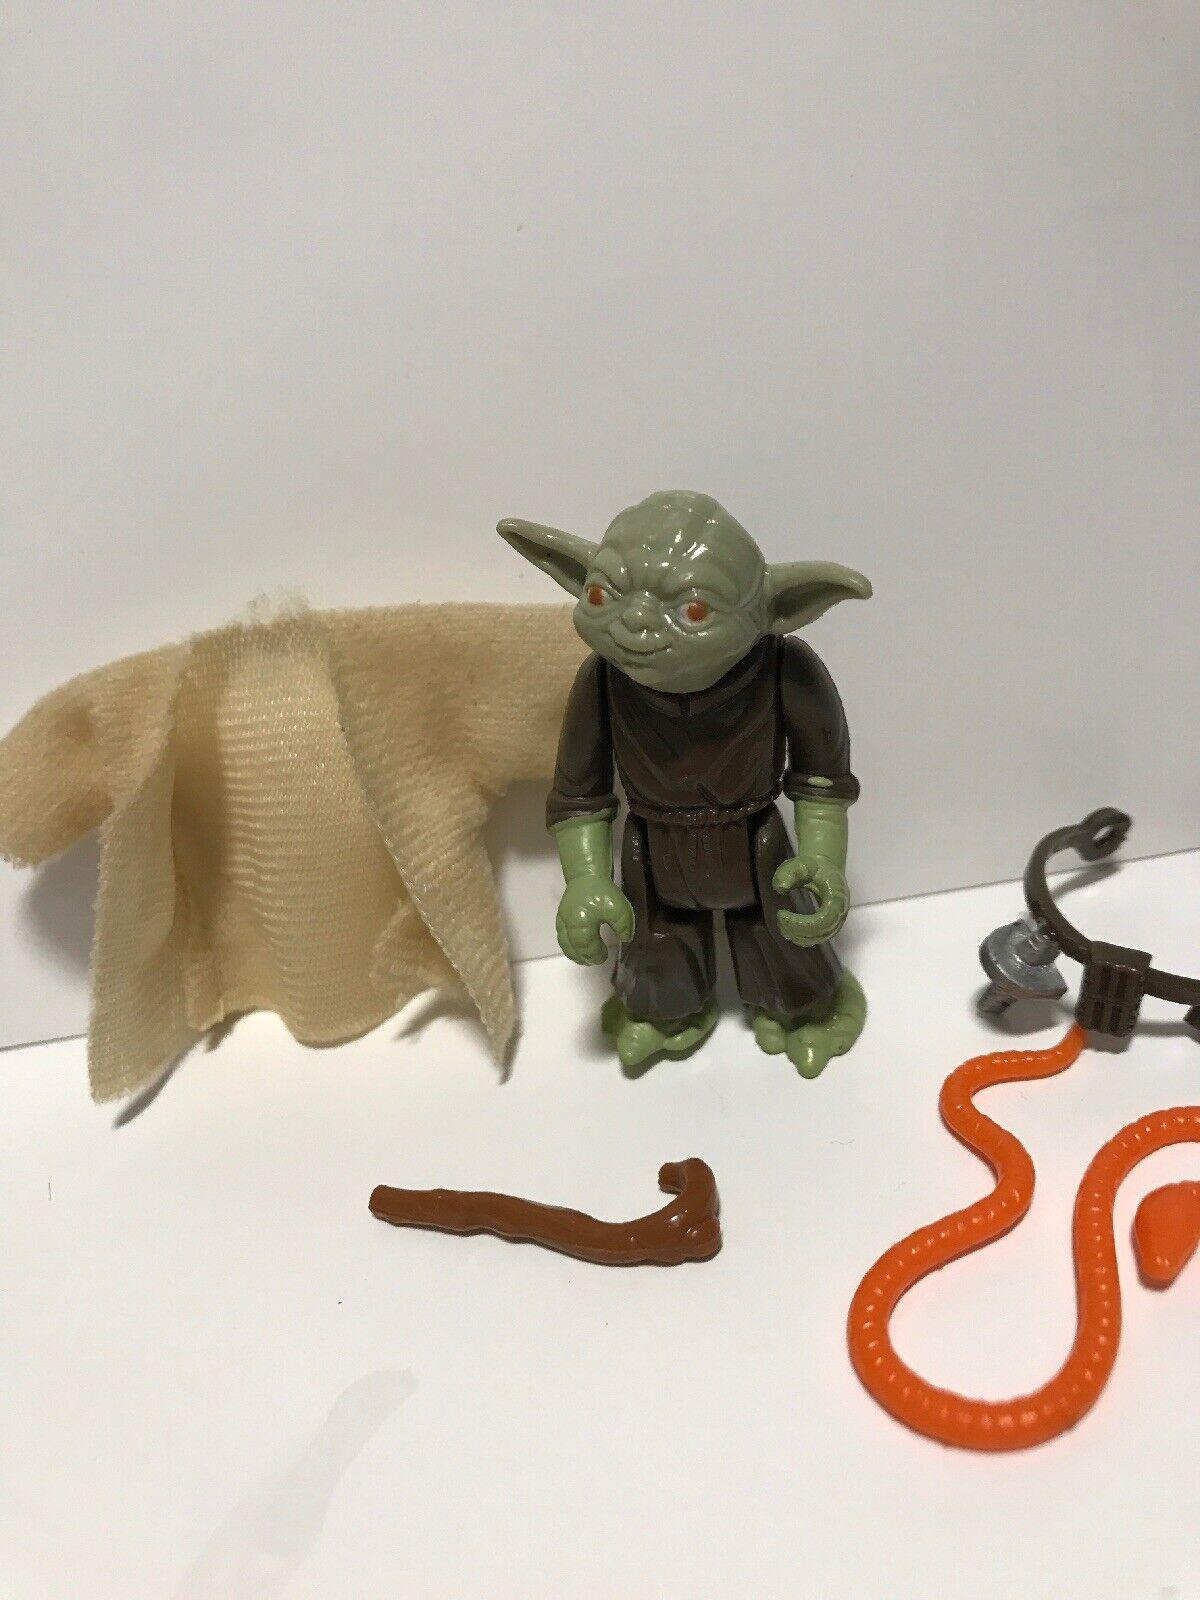 VIntage Stern Wars Yoda 1980 ESB 100% Complete Nice